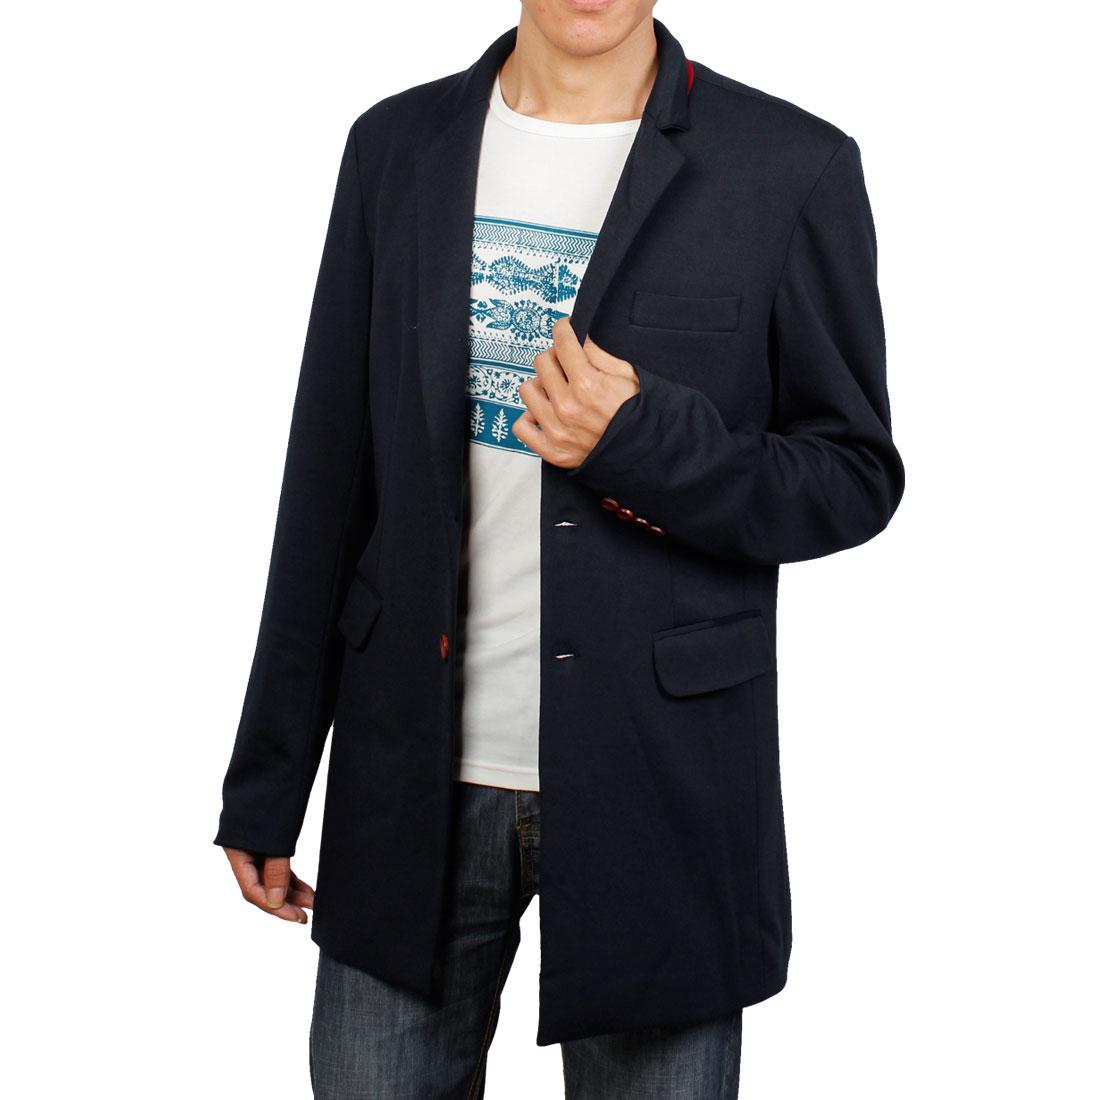 Navy Blue M Button Front Closure Chest Pocket Blazer Jacket for Men